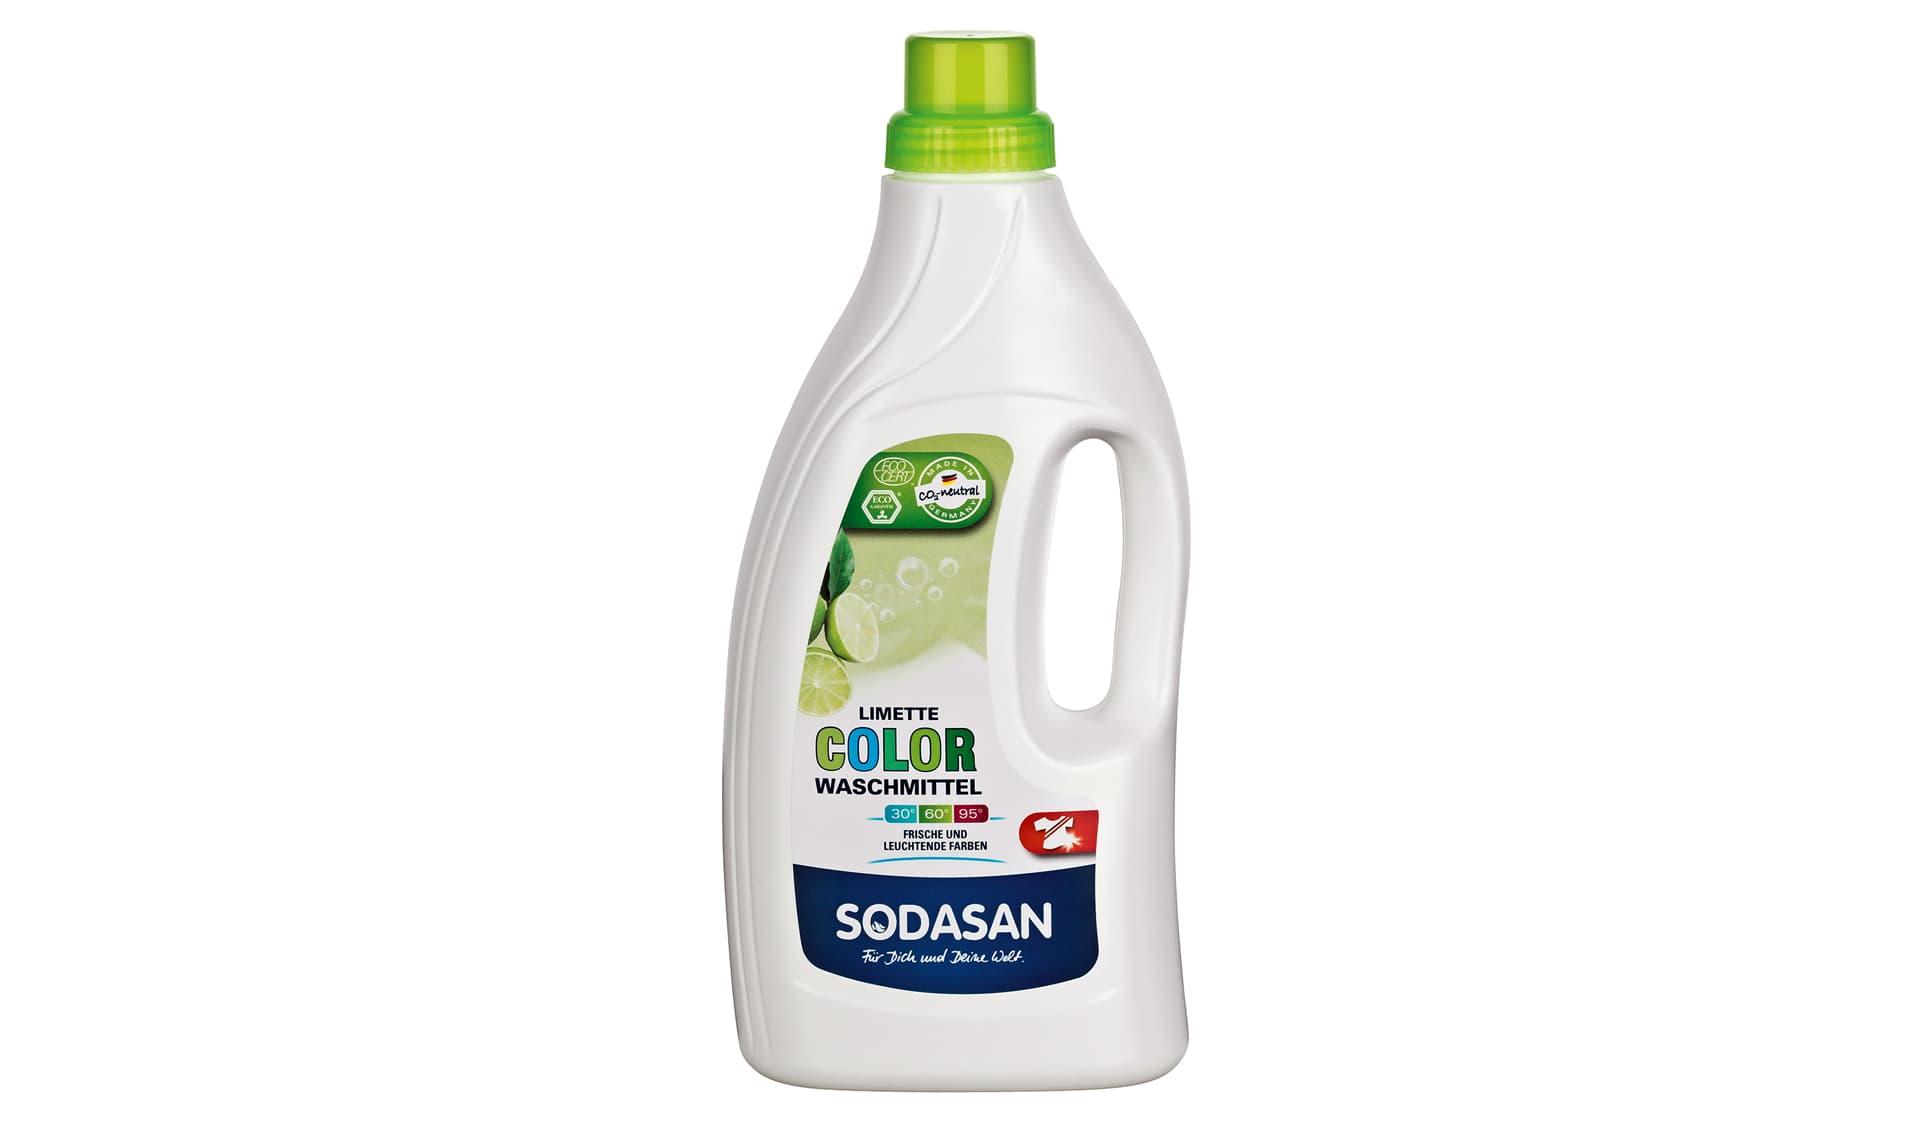 Sodasan (www.sodasan.de) Color-Waschmittel Limette